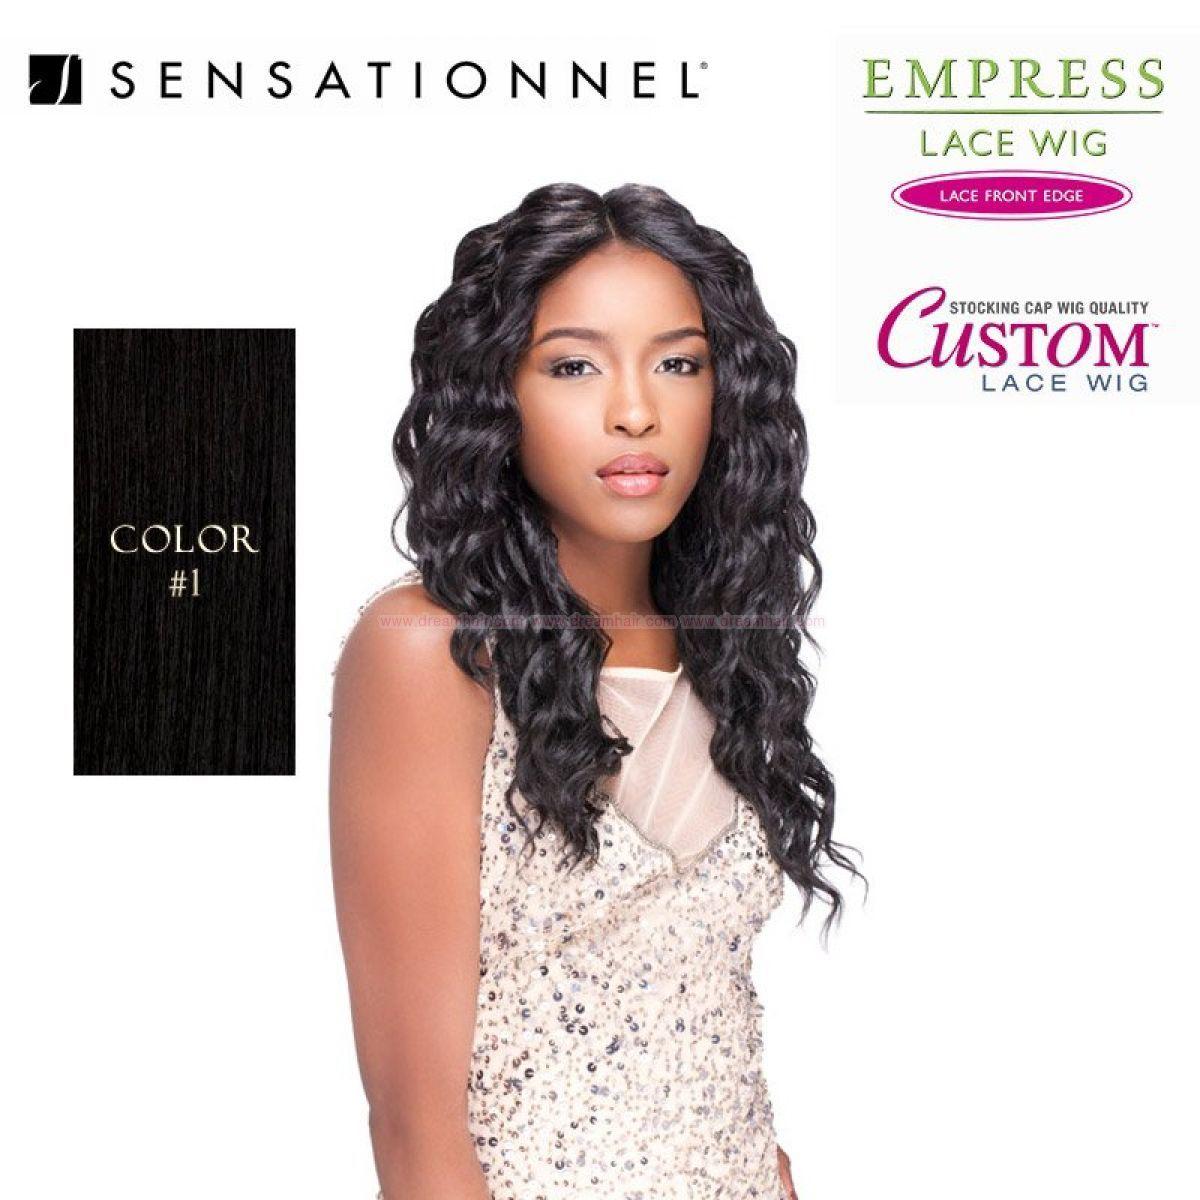 Sensationnel Empress Custom Lace Wig Loose Deep  1 - Sensationnel ... 7d987cba8